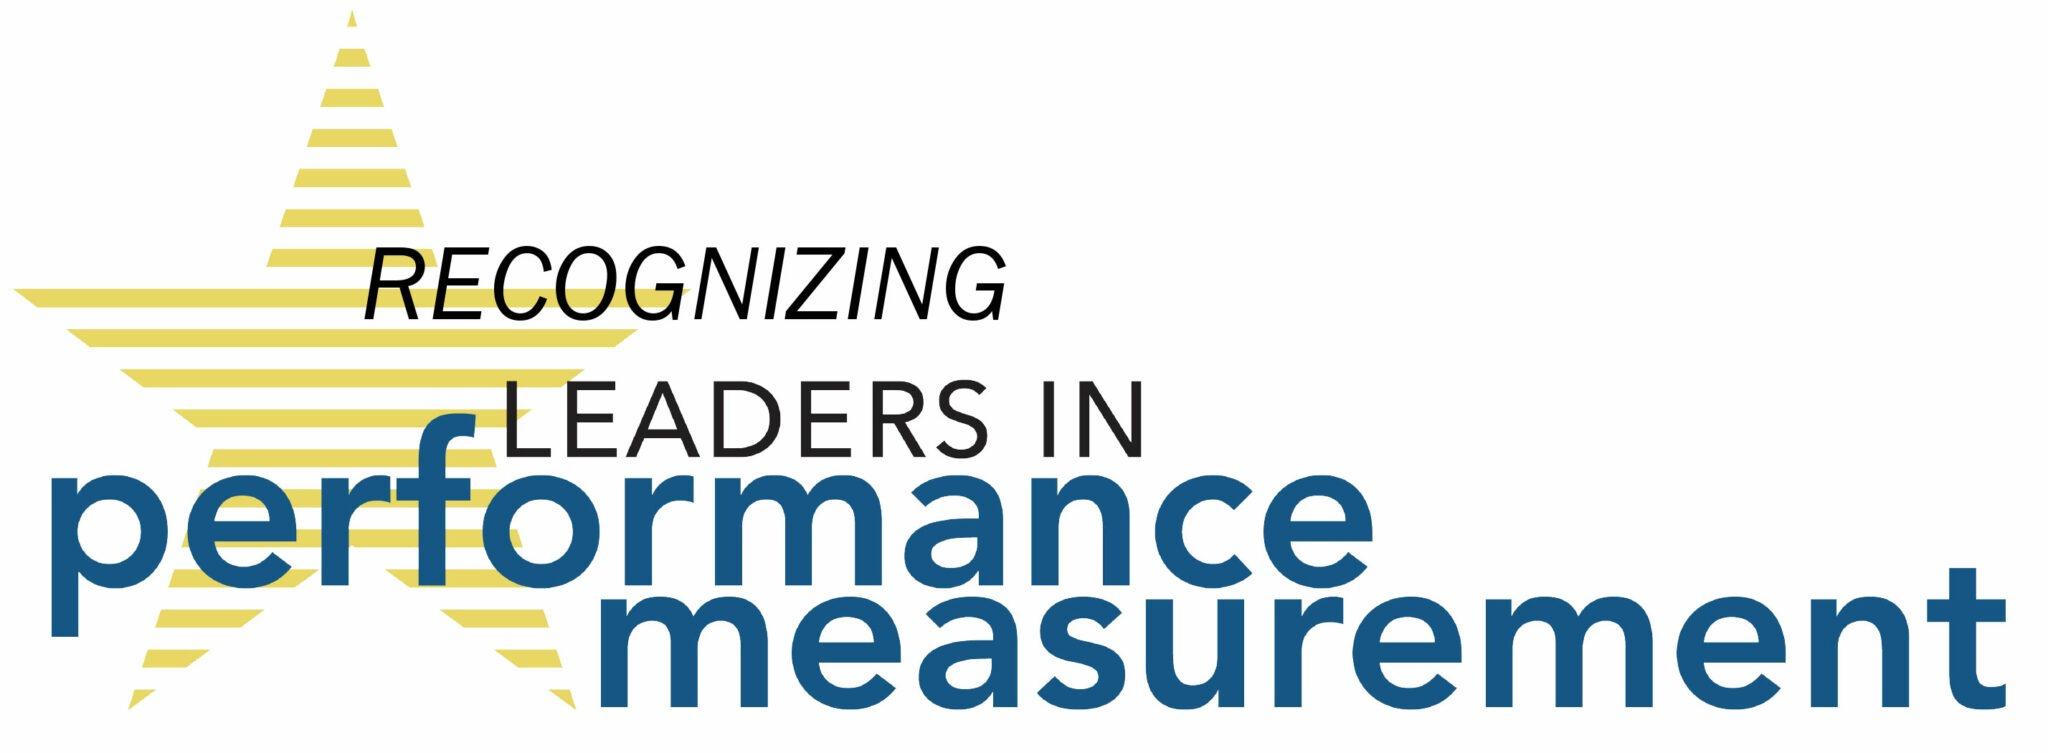 URAC Recognizing Leaders in Performance measurement